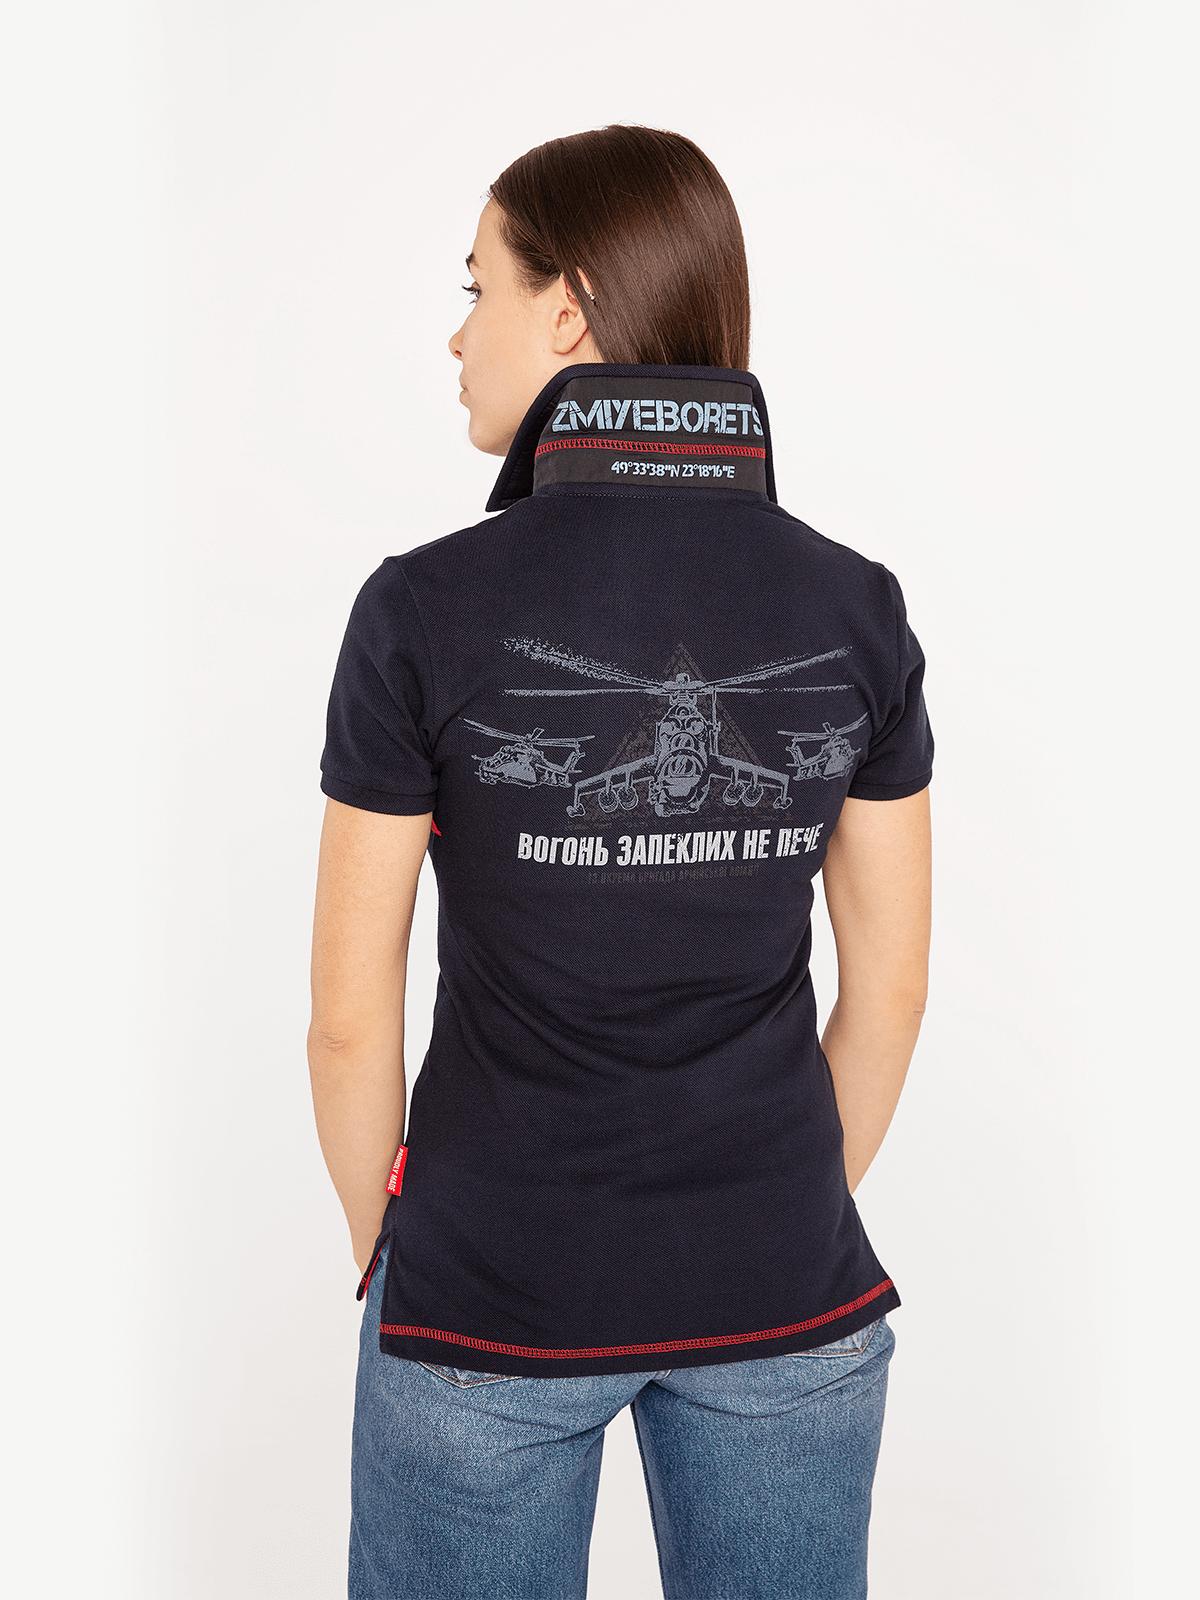 Women's Polo Shirt 12 Brigade (Kalyniv). Color dark blue.  Technique of prints applied: embroidery, silkscreen printing.